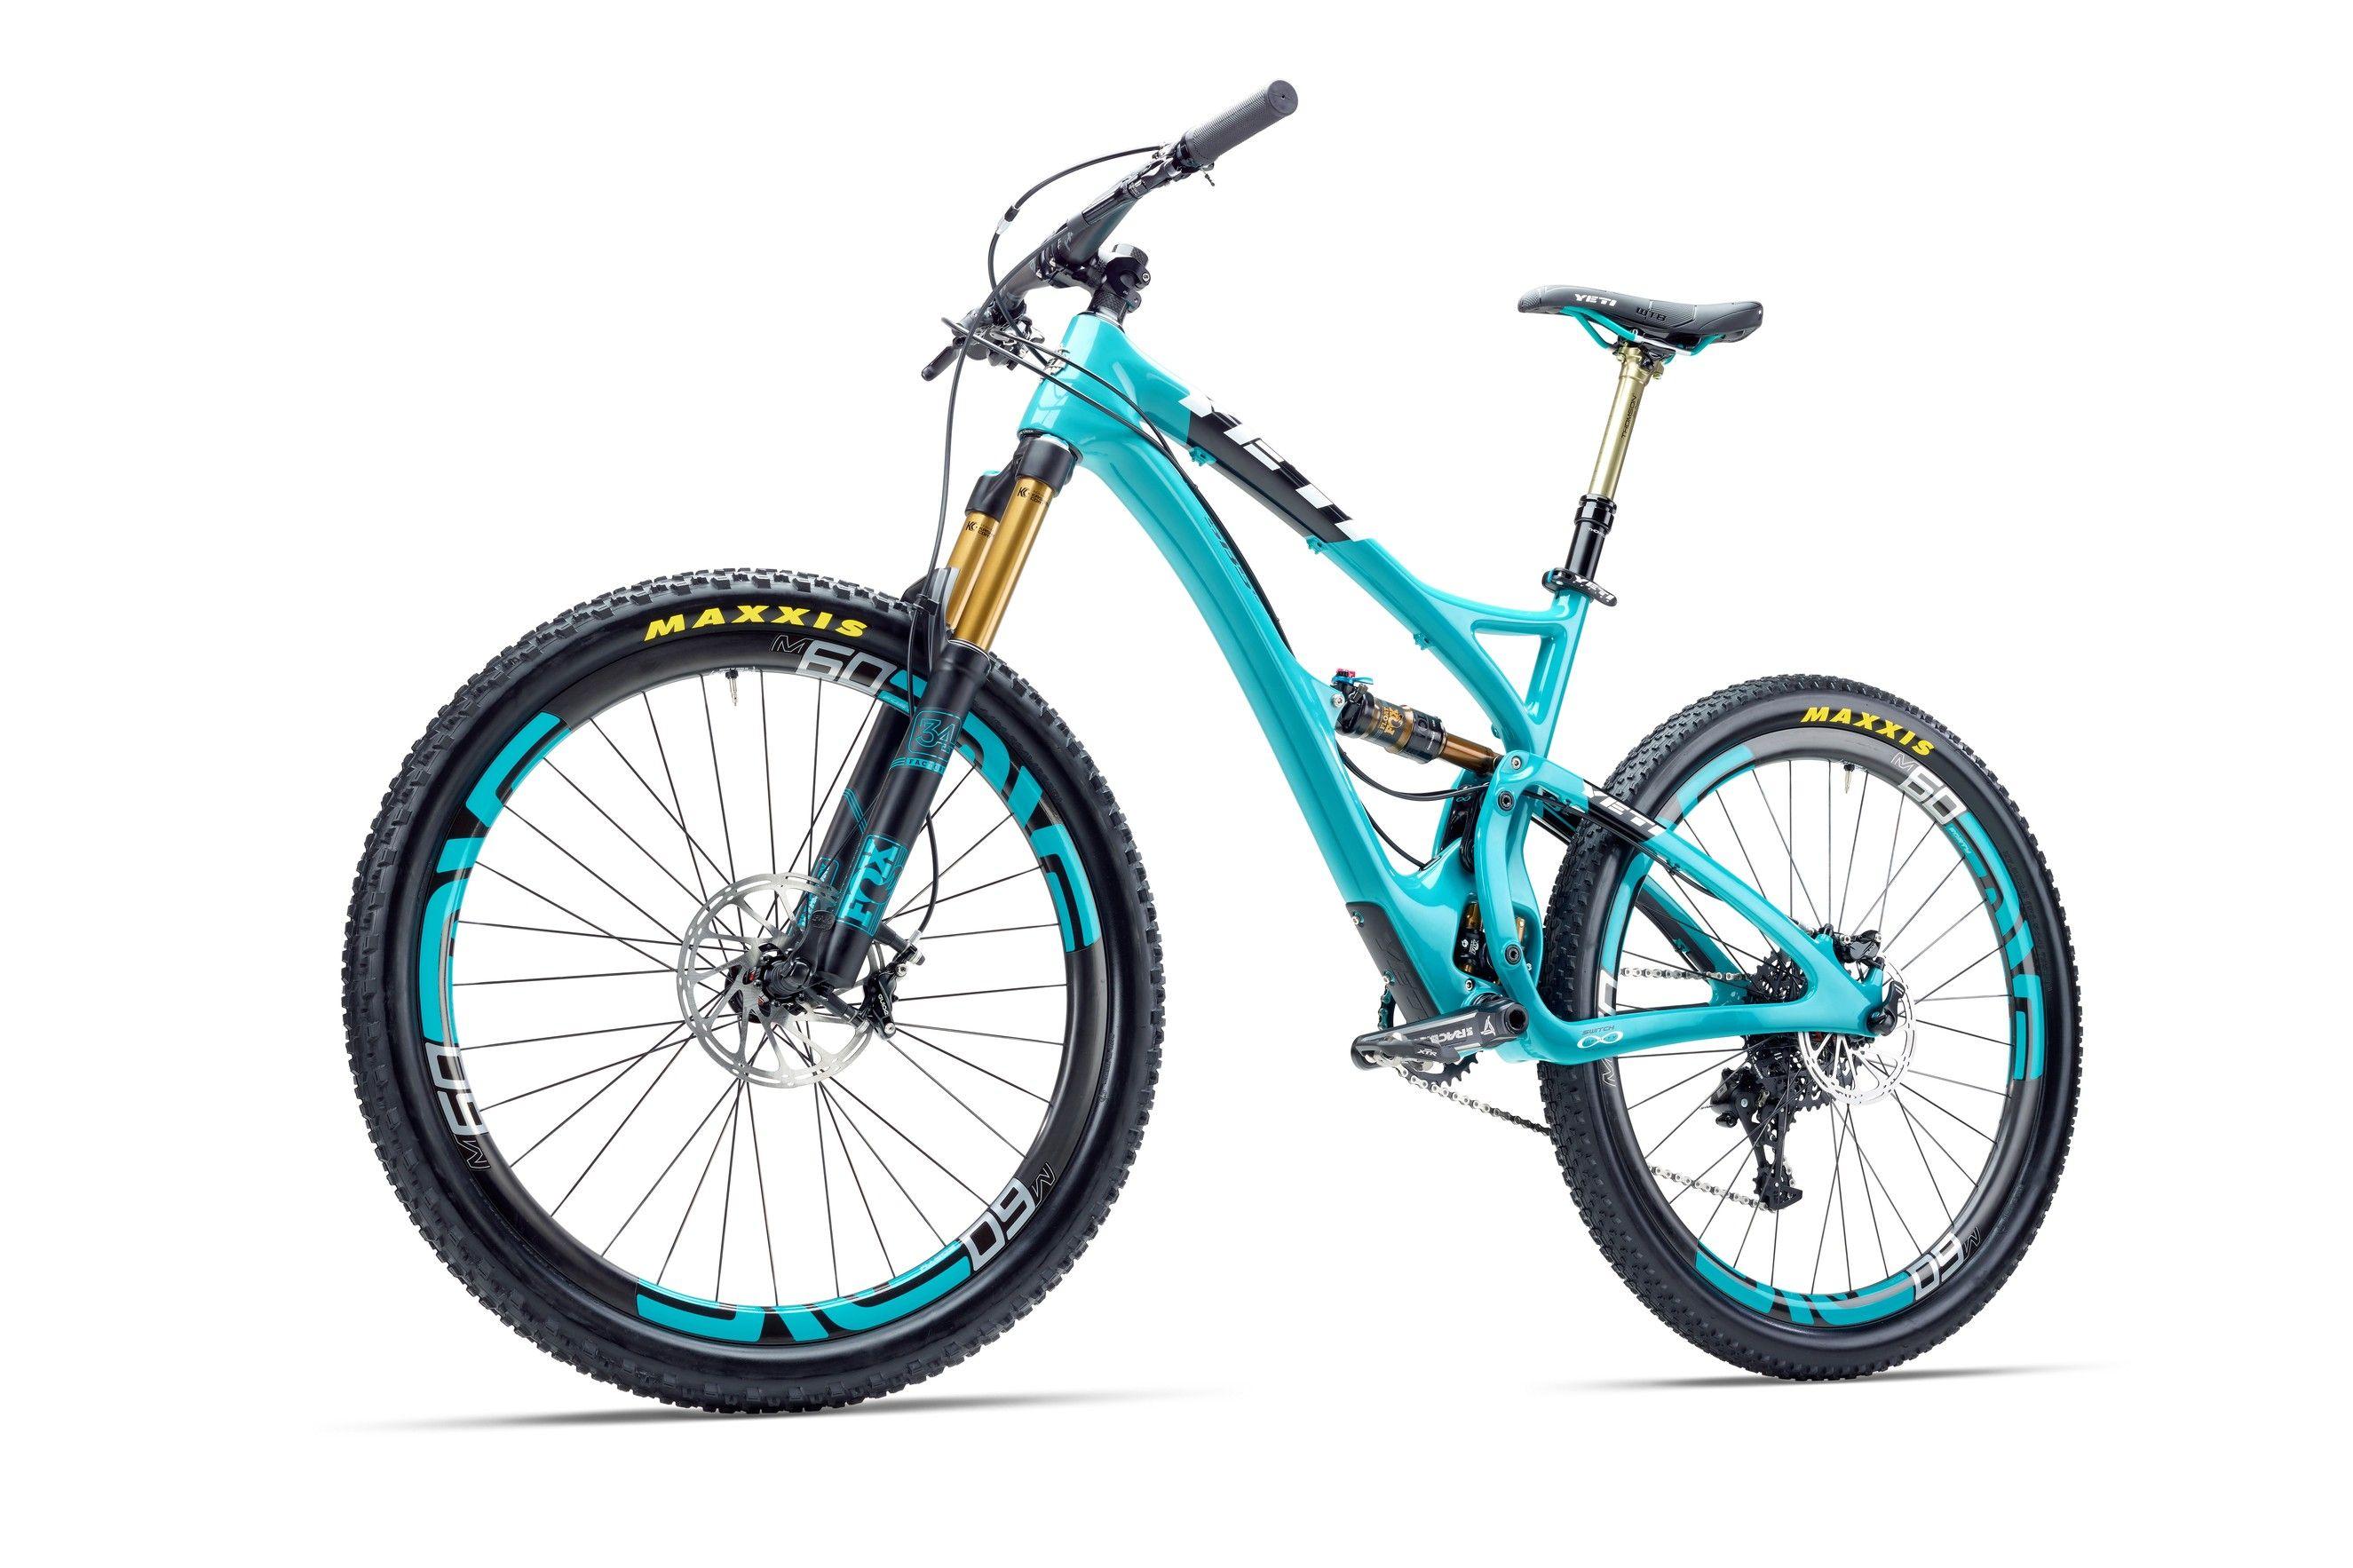 Yeti Sb5c Carbon Rahmenset Turquoise 2016 Www Rider Store De